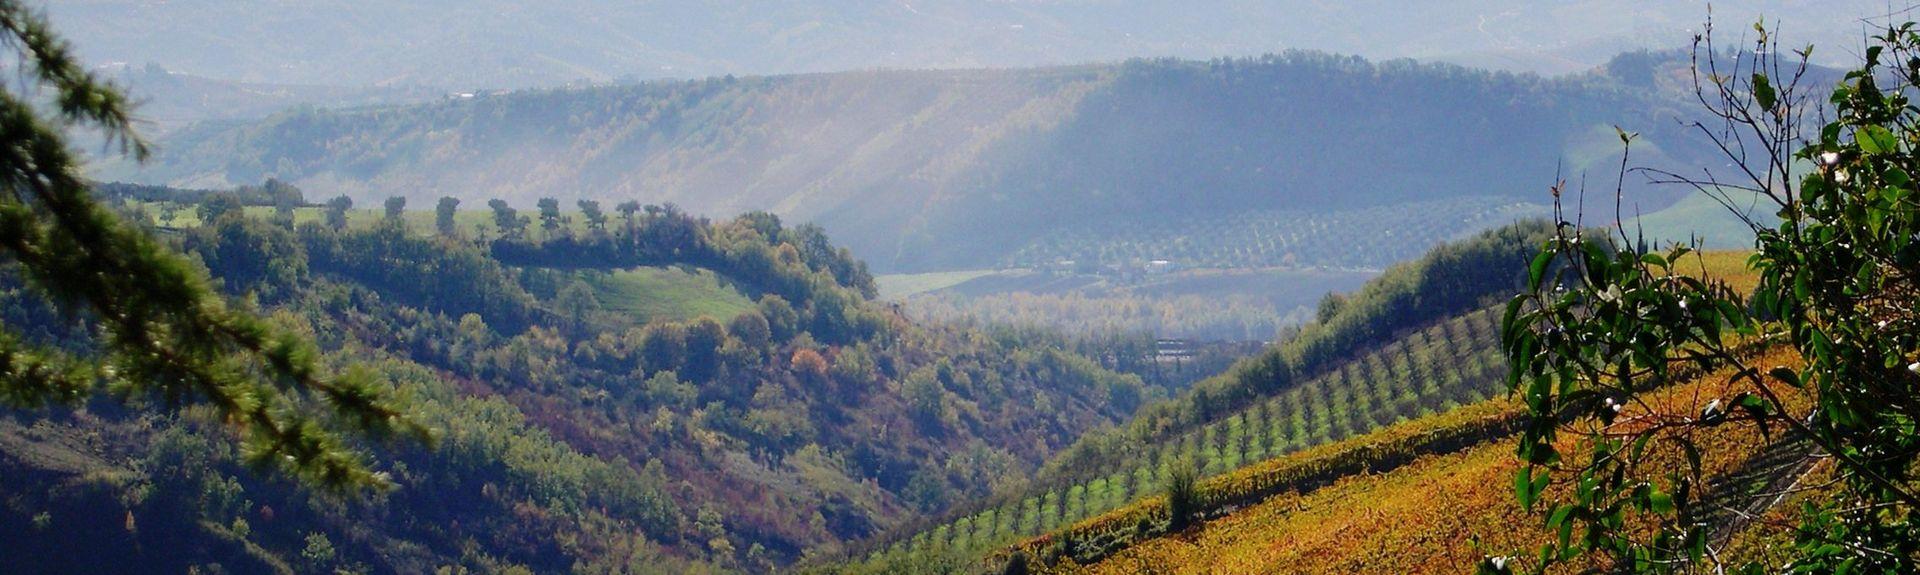 Silvi Paese, Teramo, Abruzzo, Italy